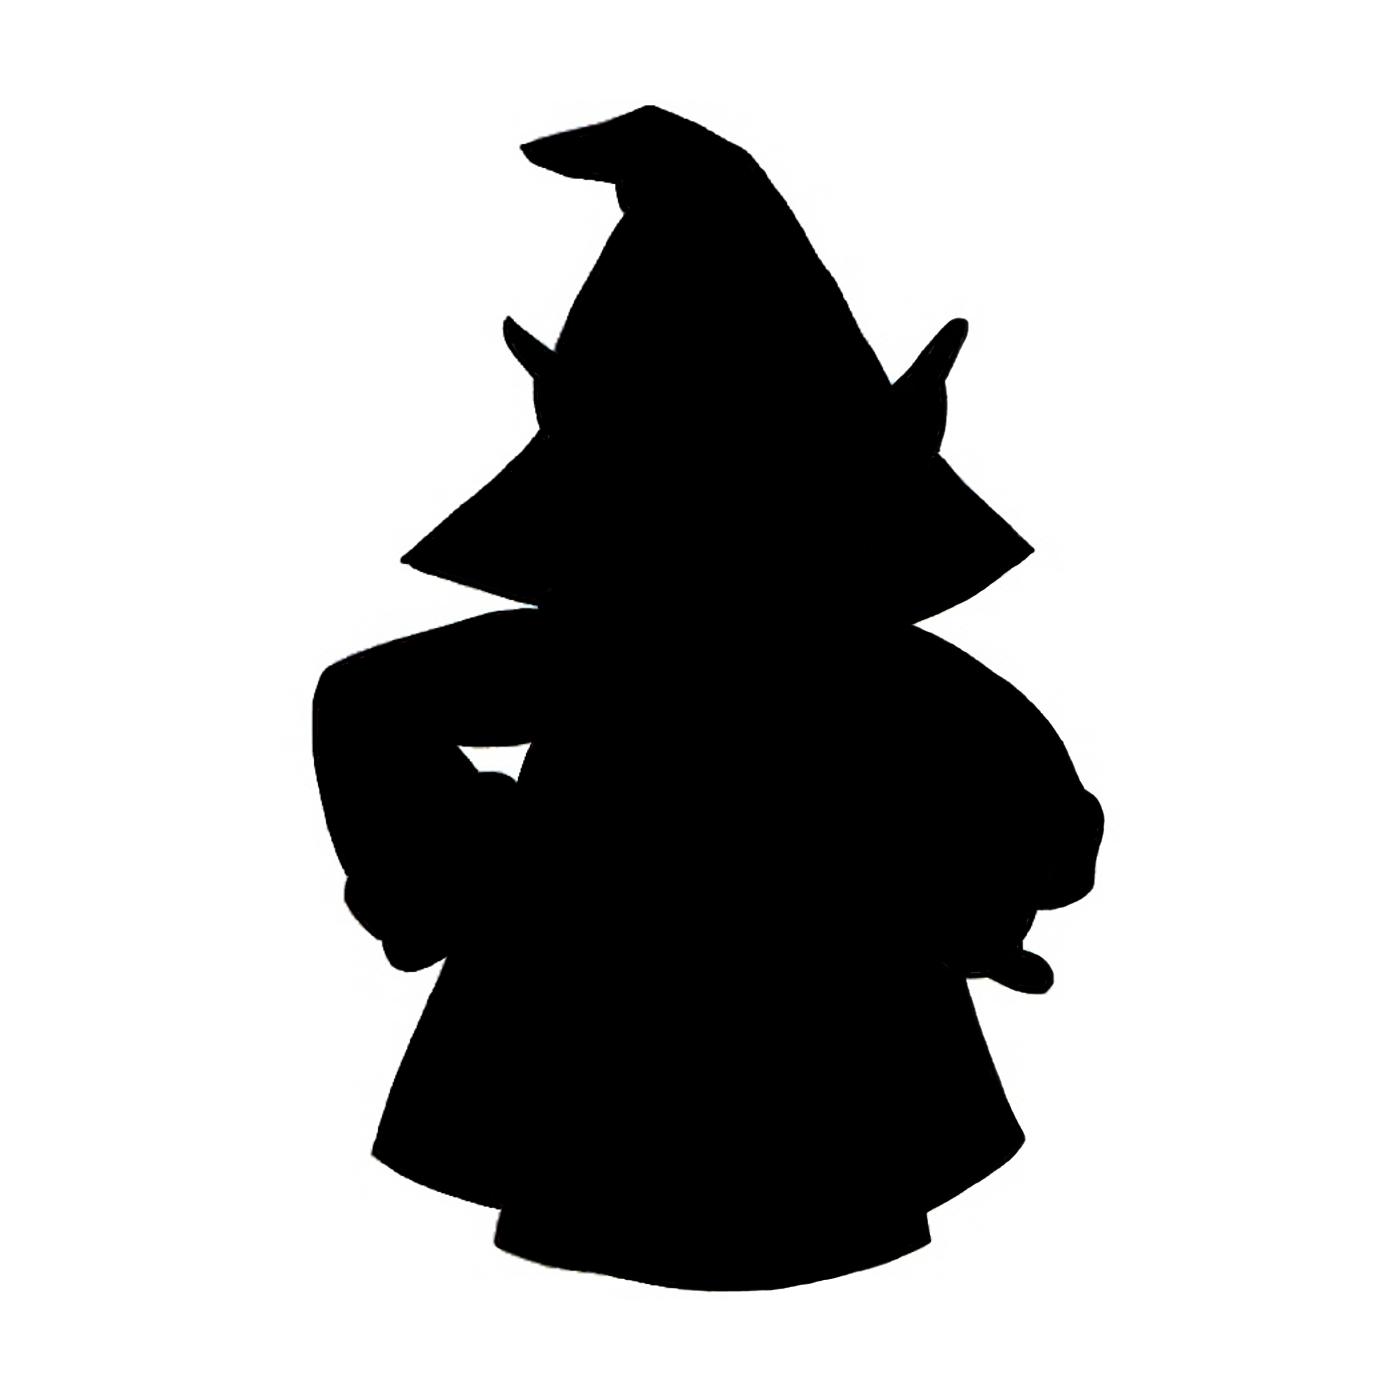 L2S132: Orko - Hiding In Plain Sight EP